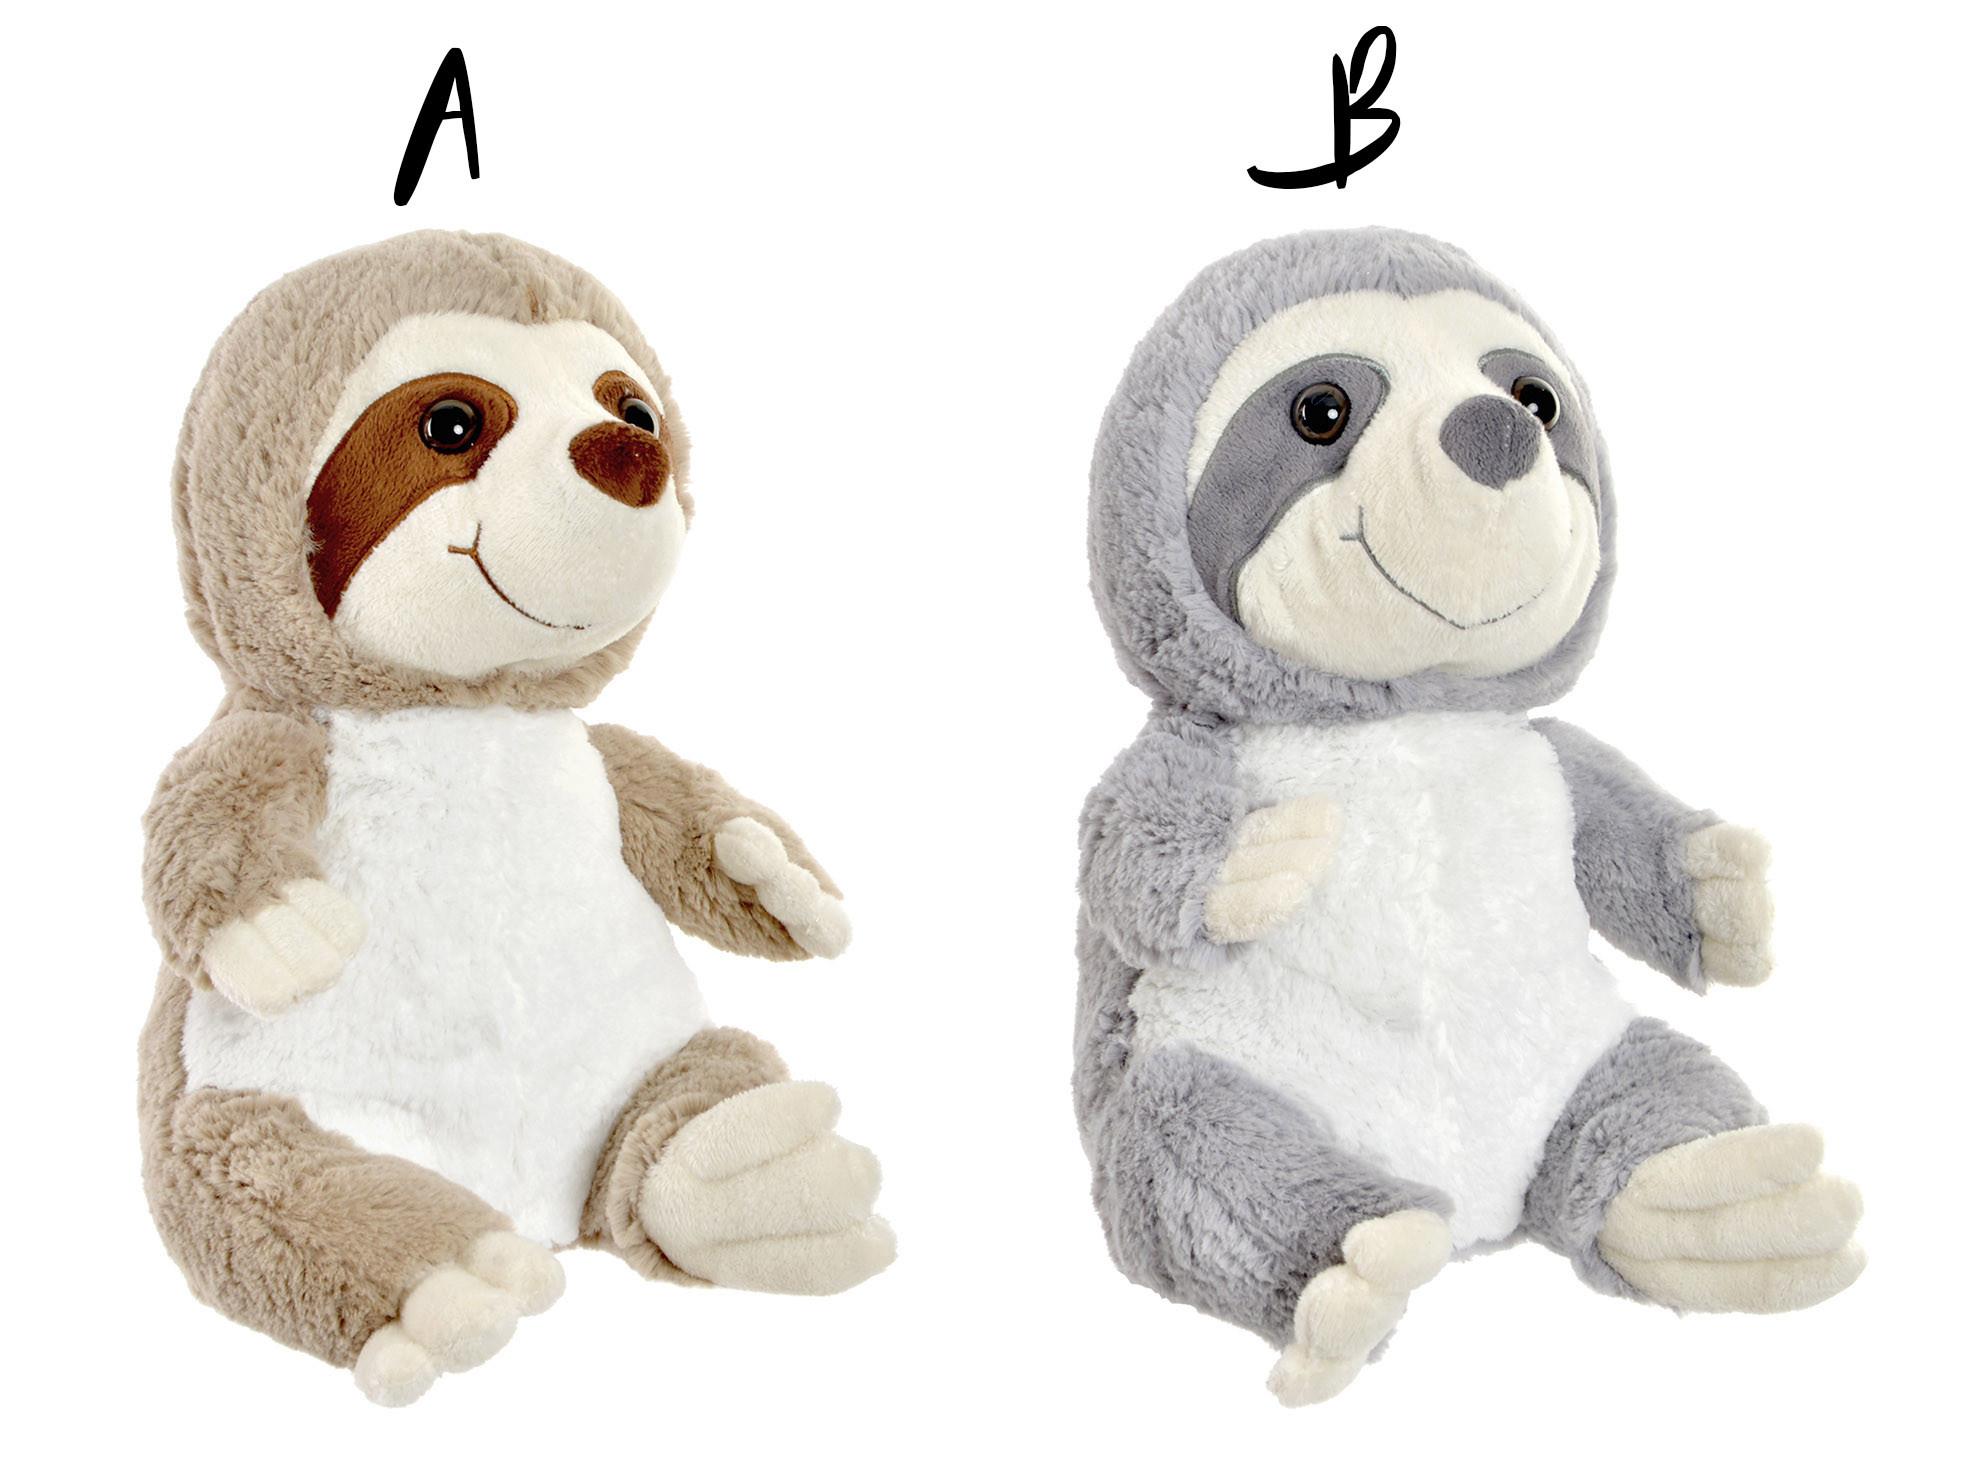 Sujetapuertas Decorative Sloth Bear on Polyester, Ideal for your Original home/Cheerful 18X21X25 cm-Hogarymas-